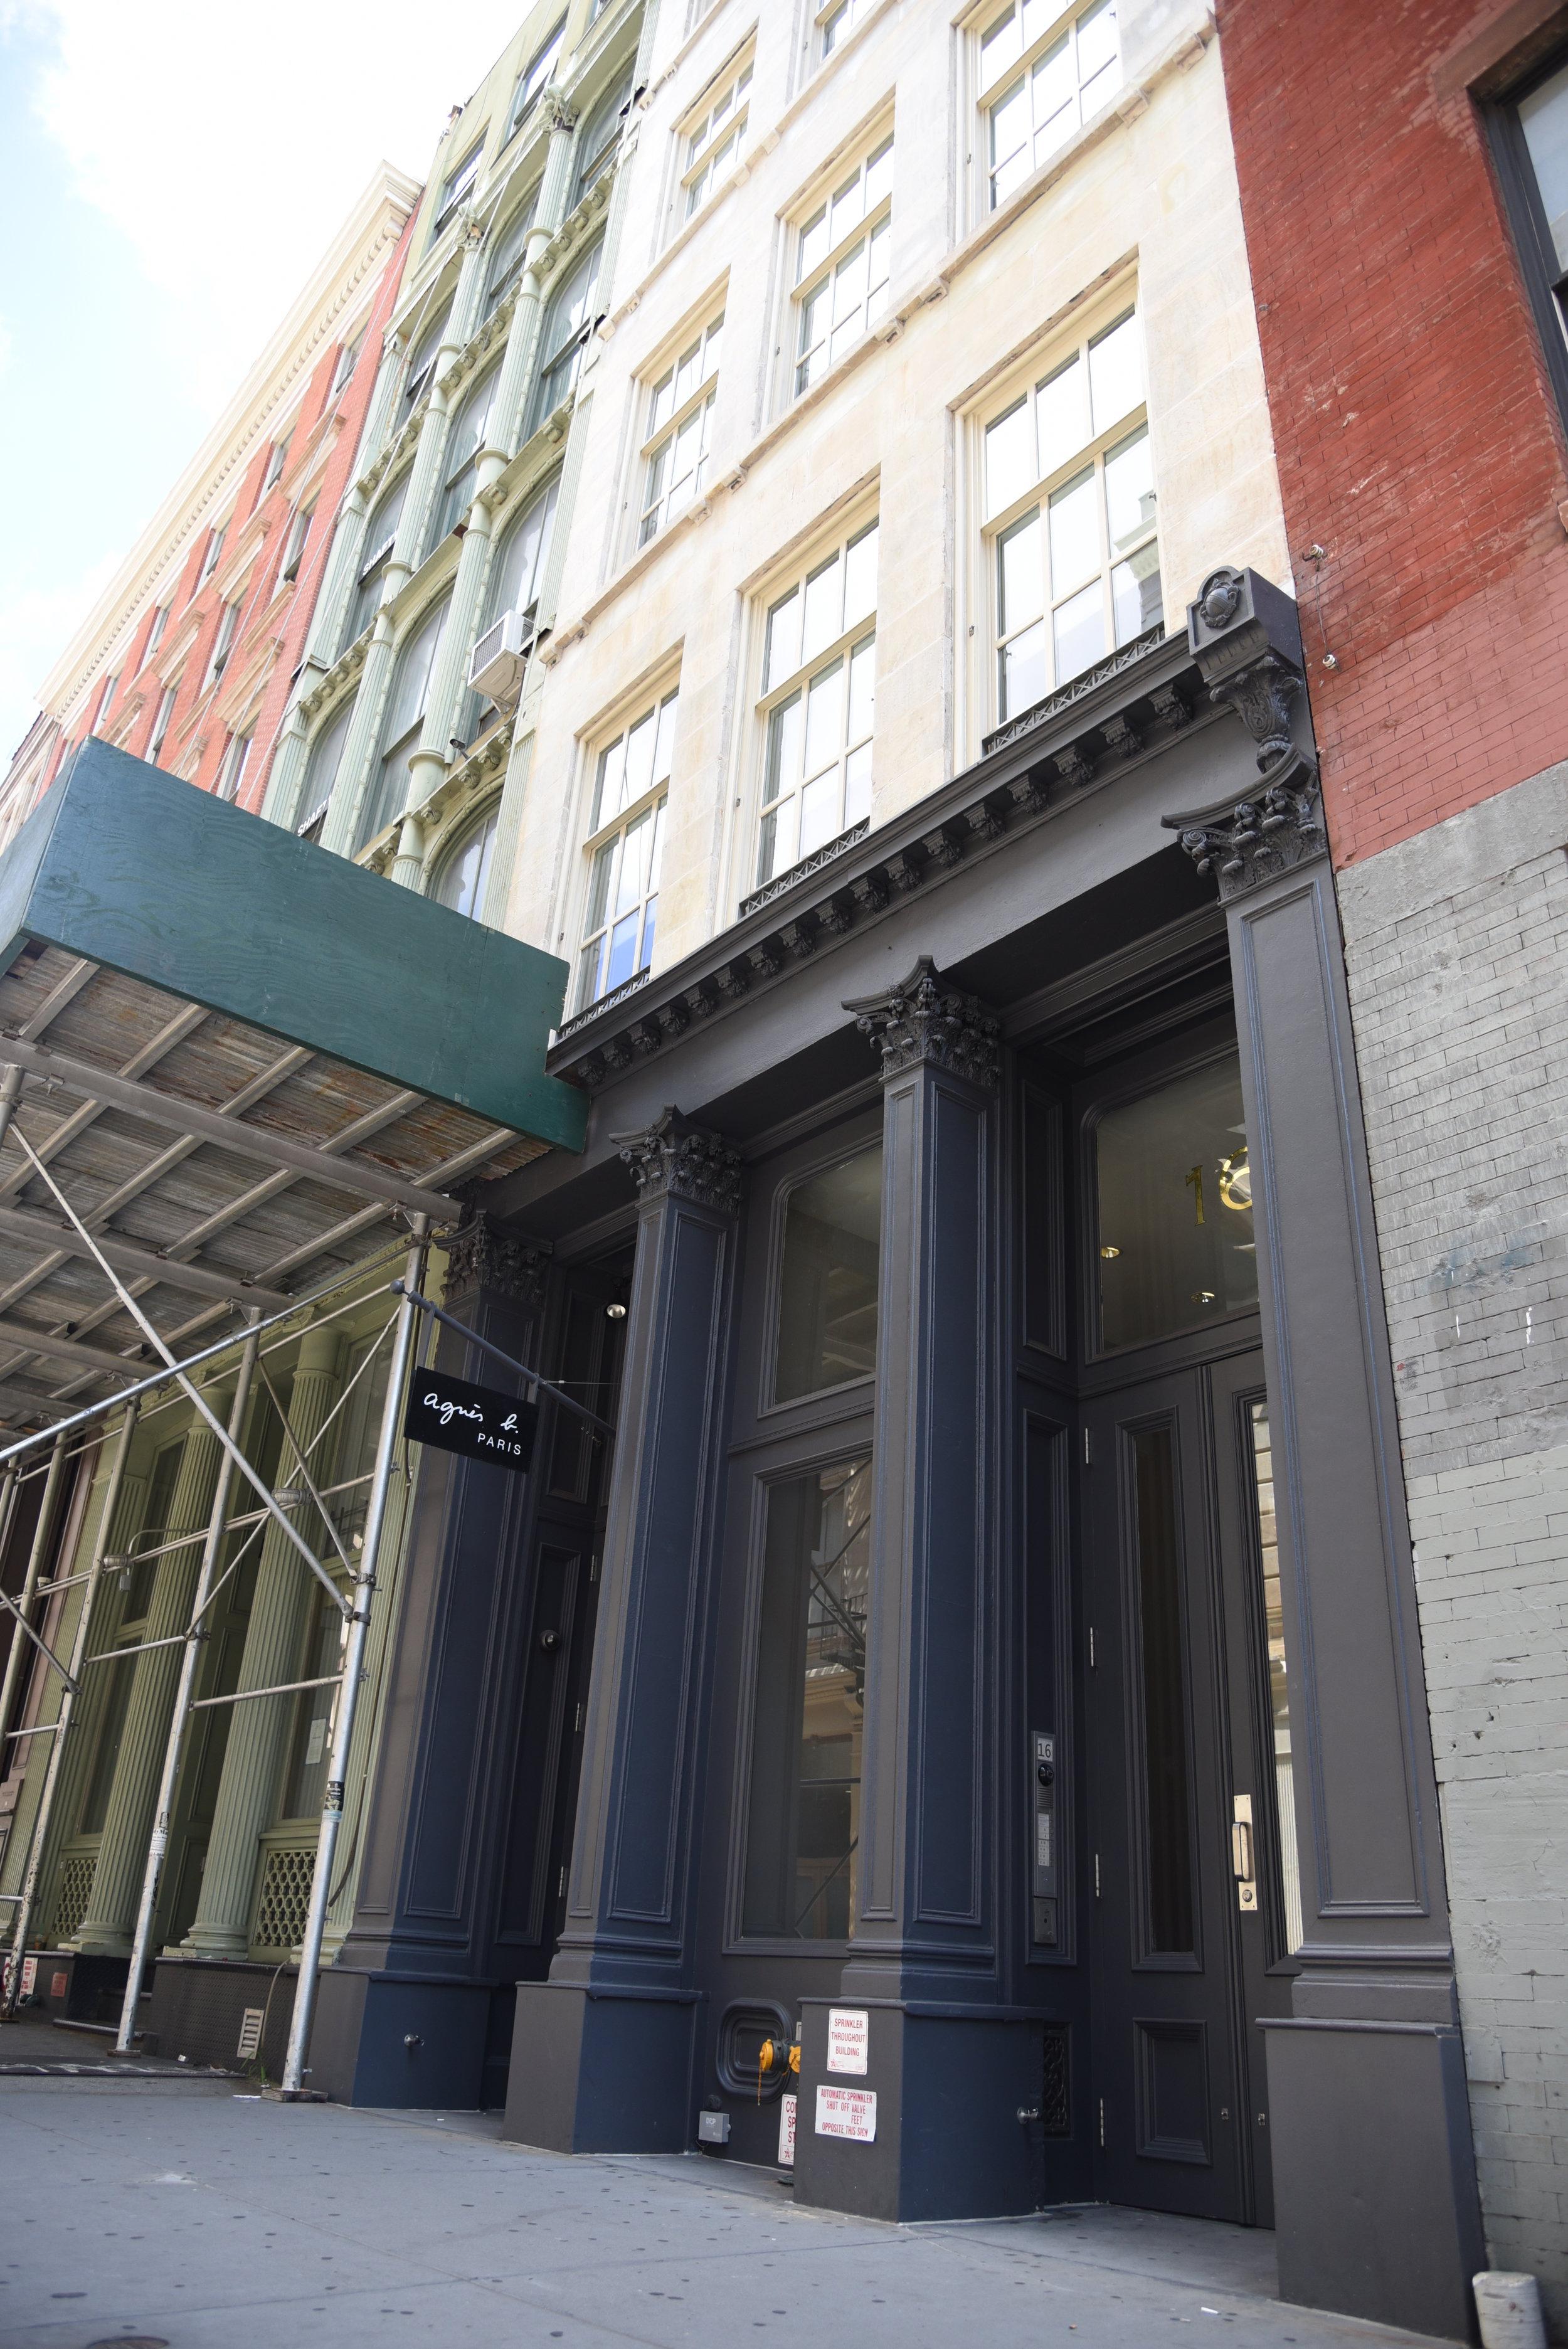 16 Mercer Street - Architect: CR Studio5 story Joint Living-Work Quarters building